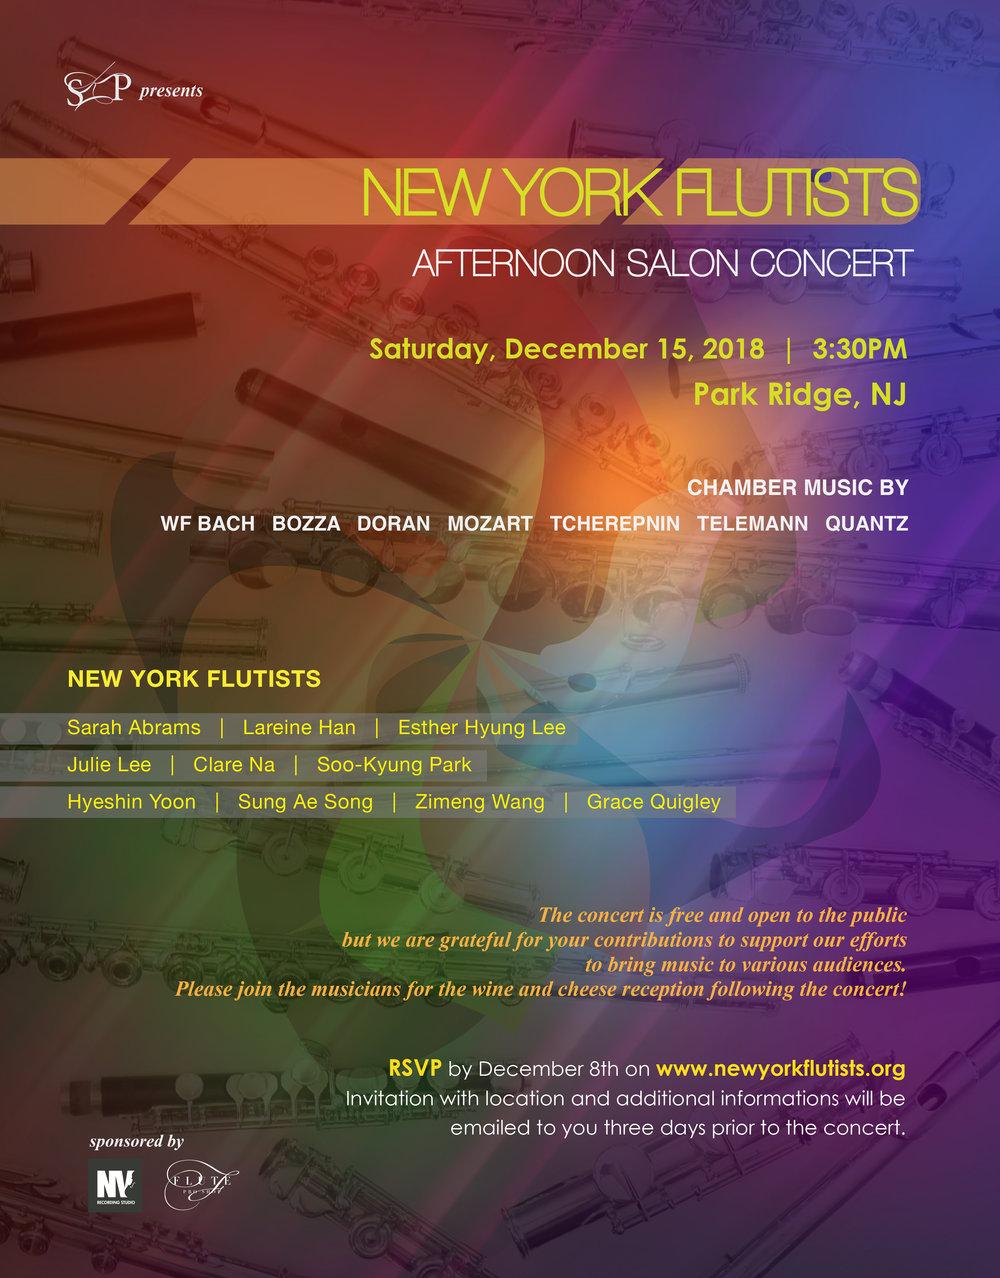 New York Flutists Afternoon Salon Concert